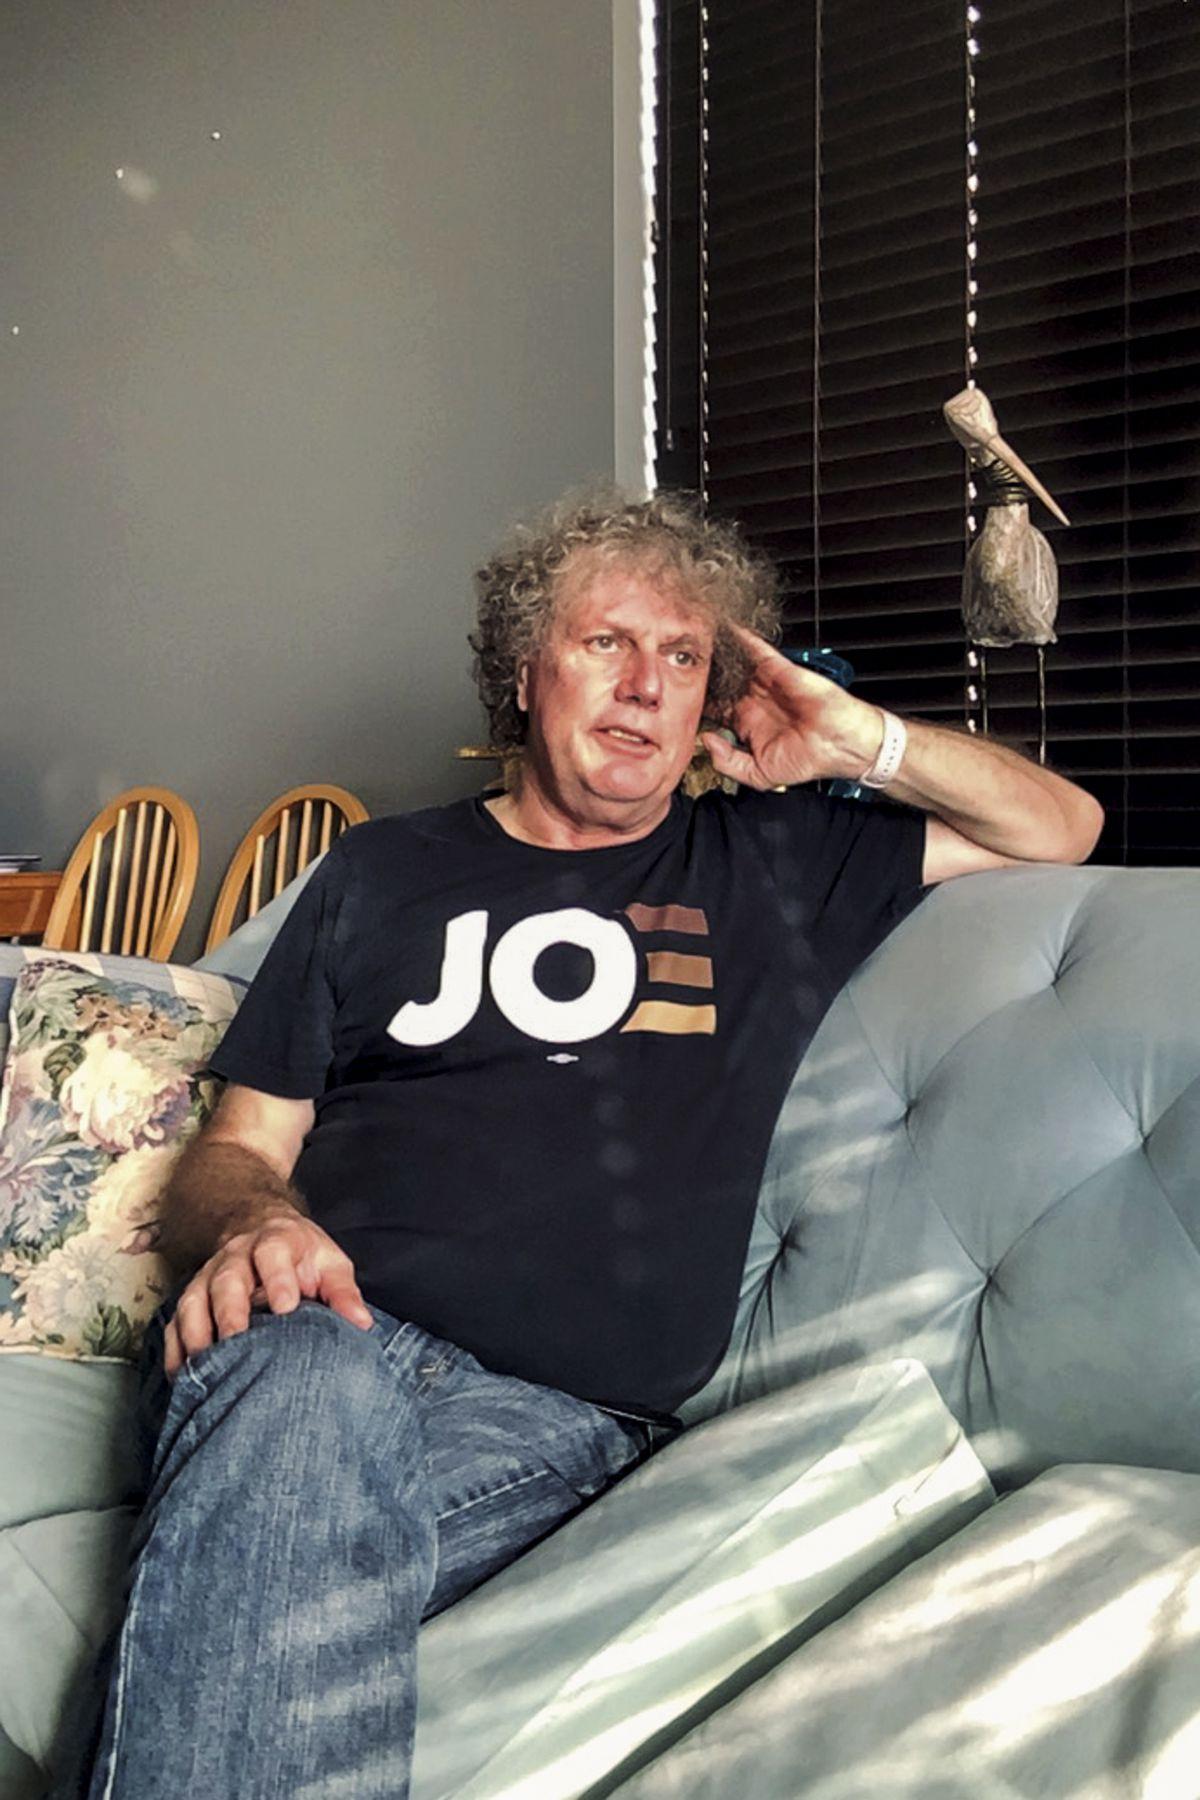 Gerard Harbison sitting in his apartment wearing a Joe [Biden] t-shirt.